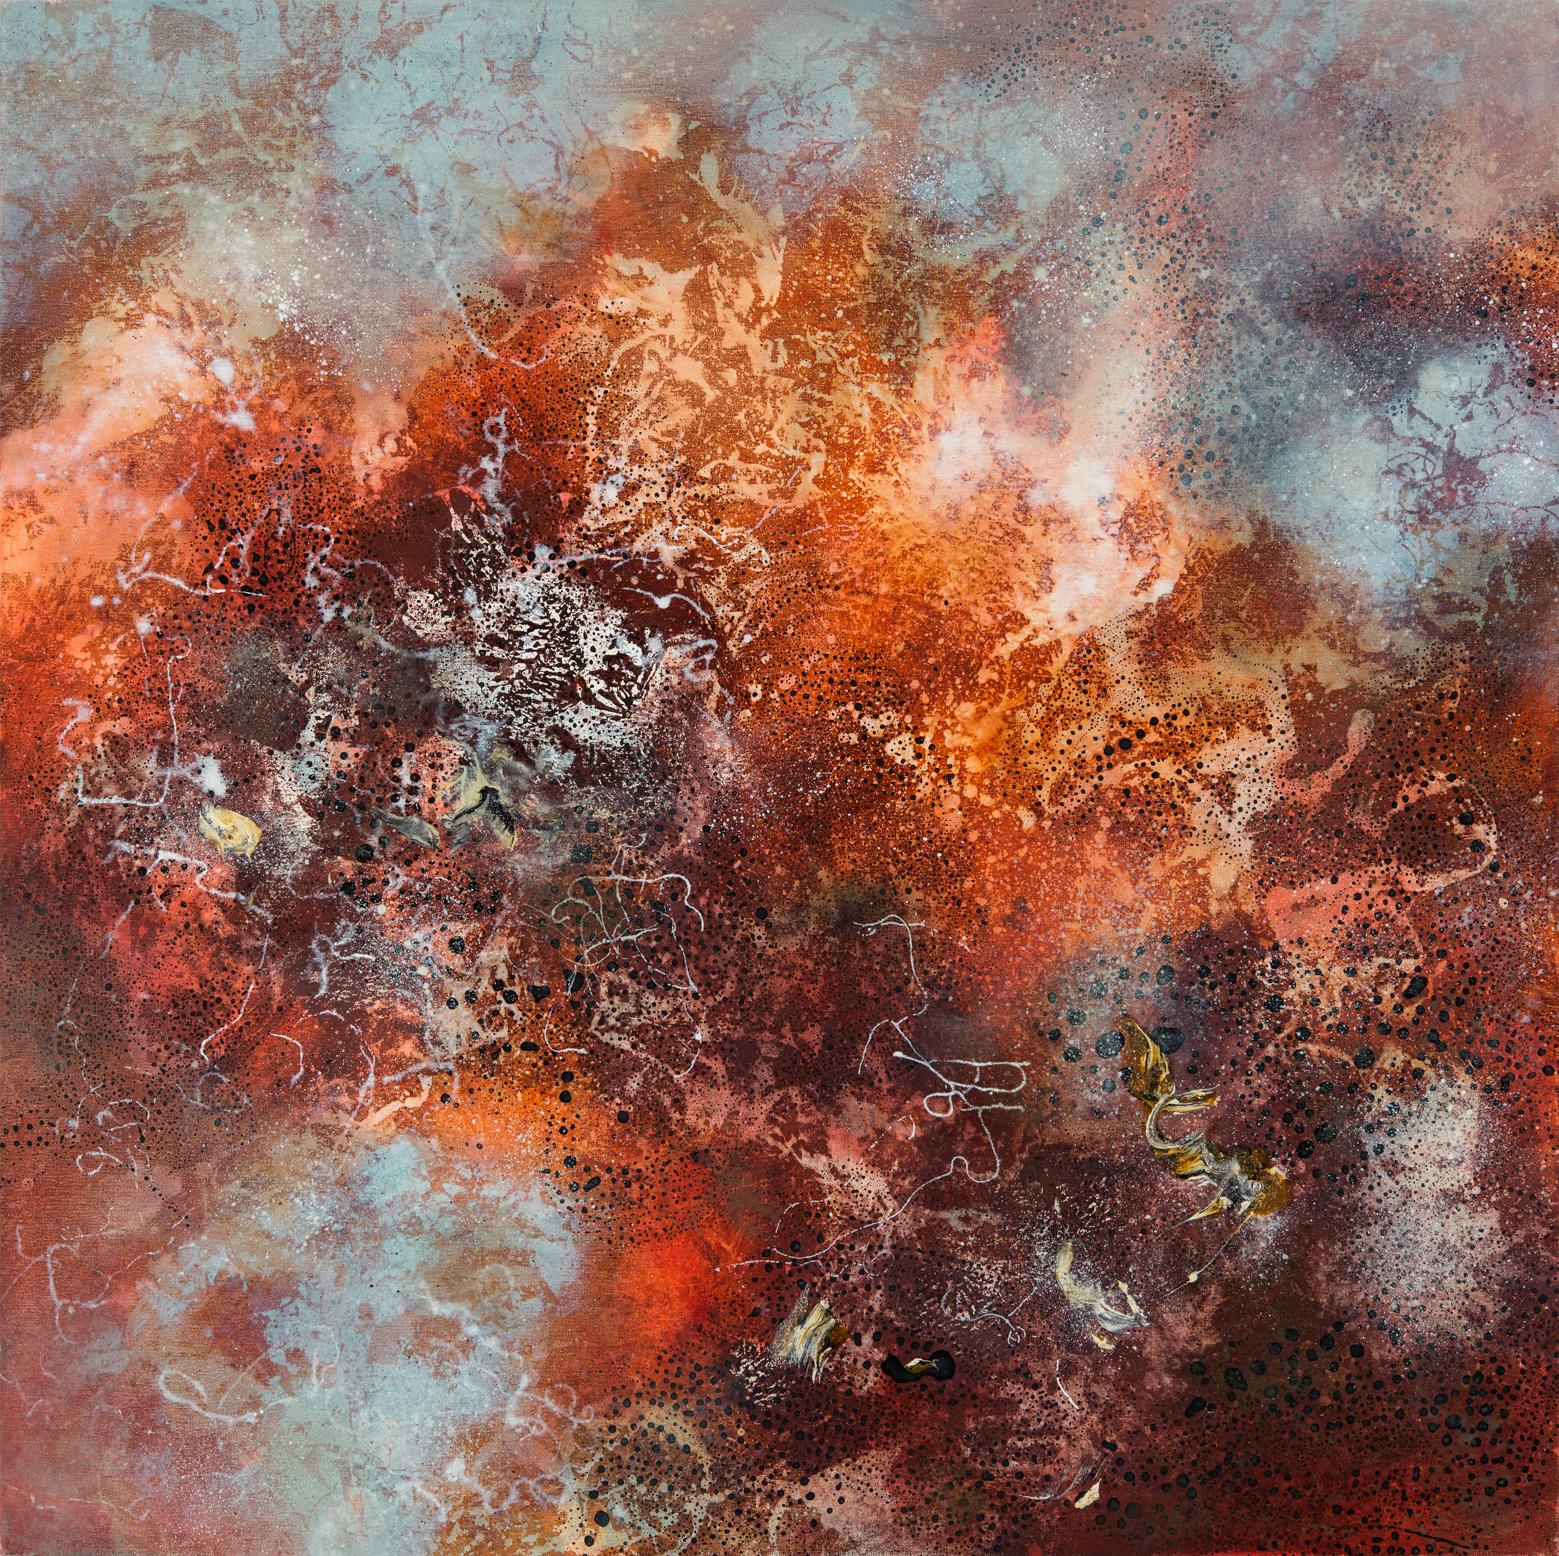 Primal Matter II, oil on canvas, 102 x 102 cm